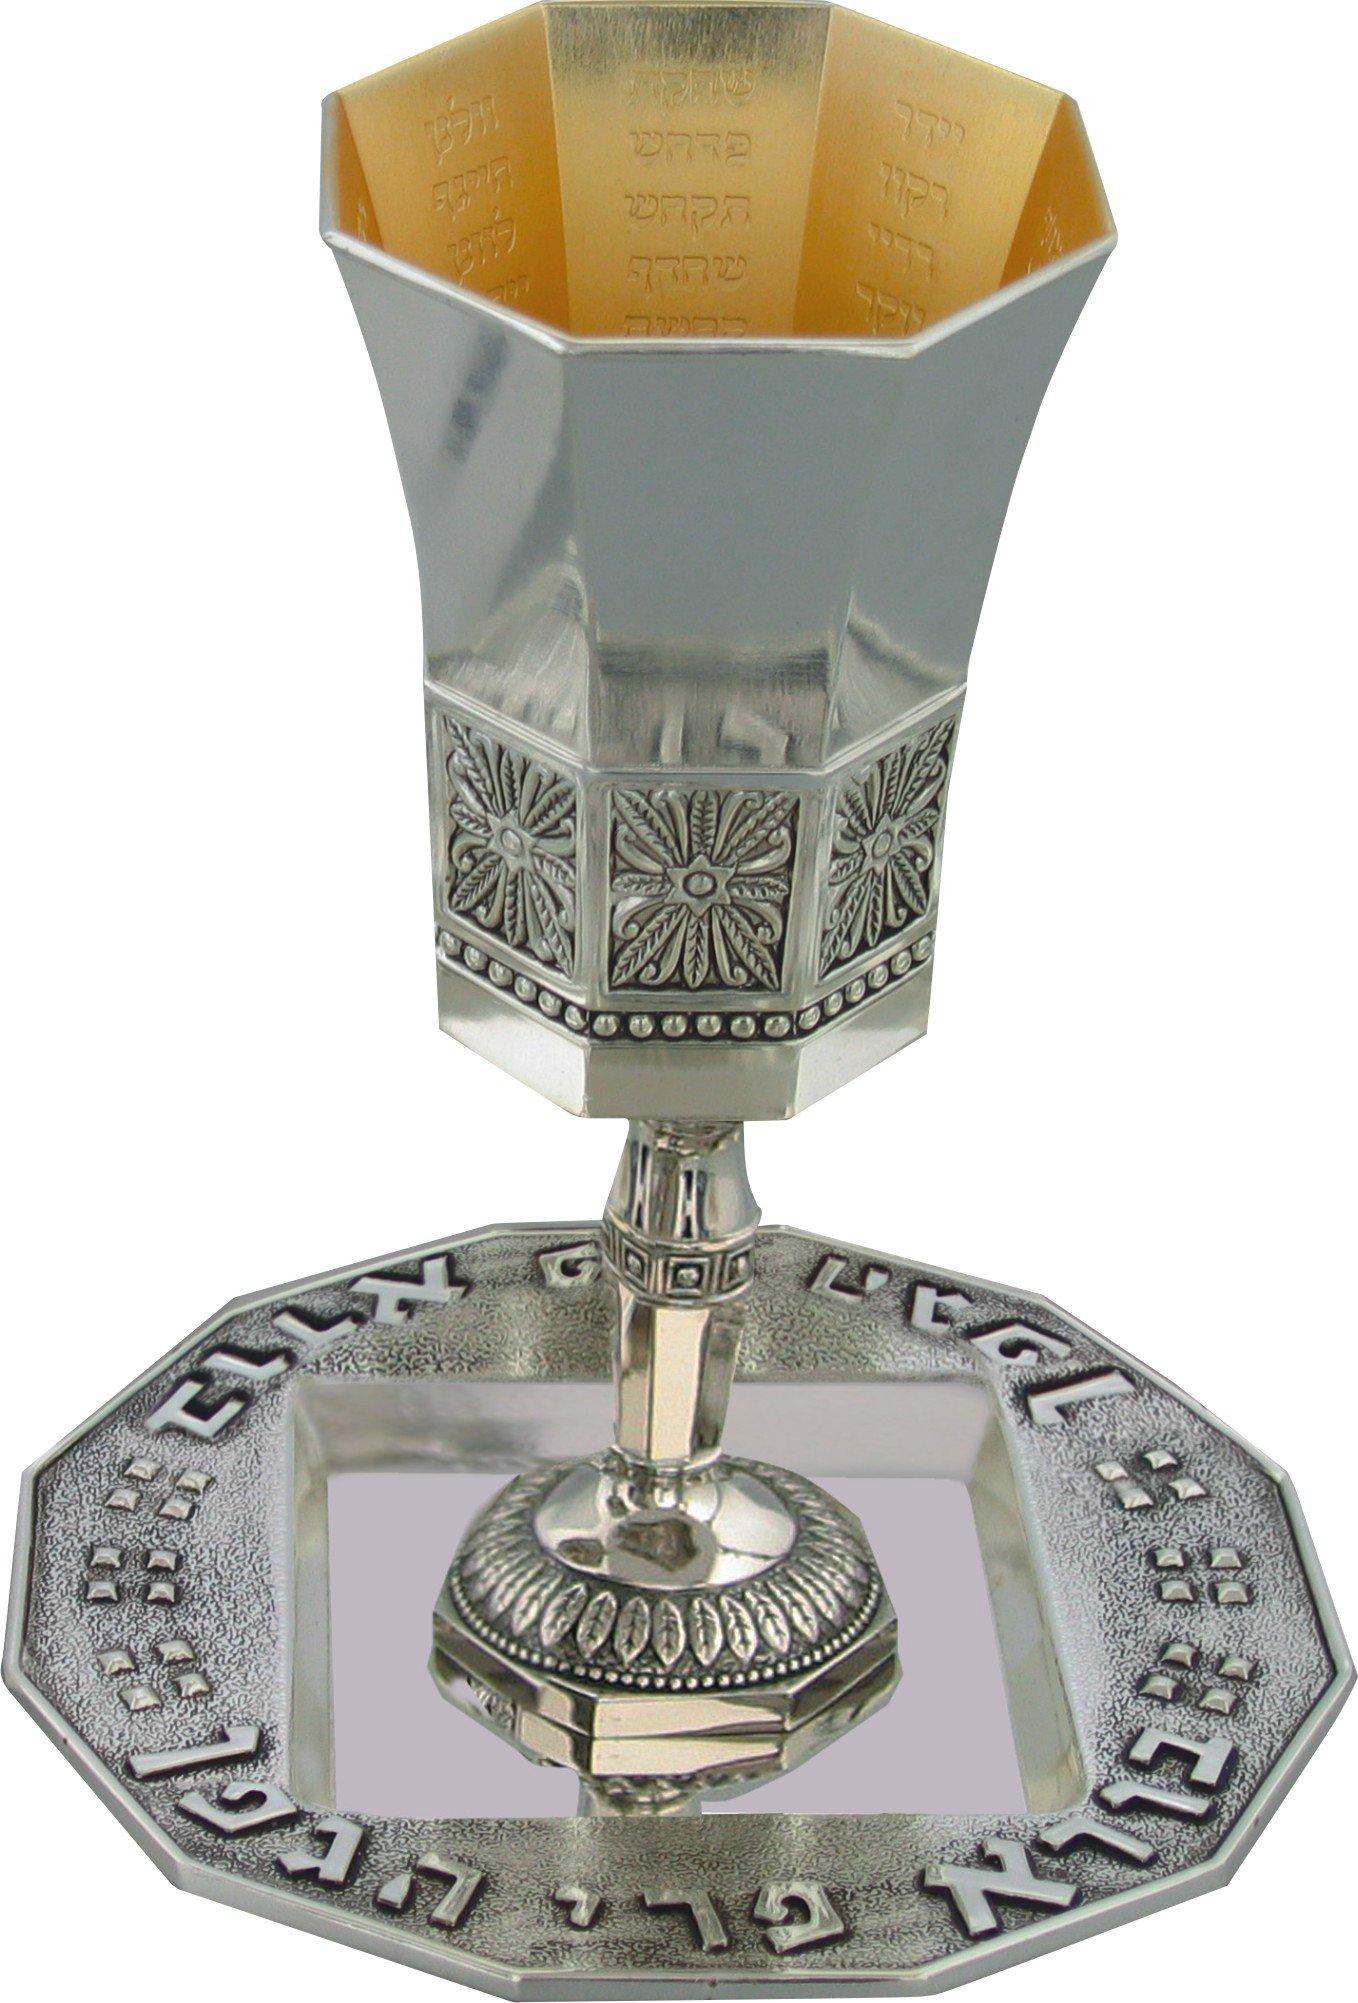 Talisman4U KIDDUSH CUP and Tray Set for Shabbat Havdalah Silver Plated Nickel Wine Goblet Judaica Holiday Gift